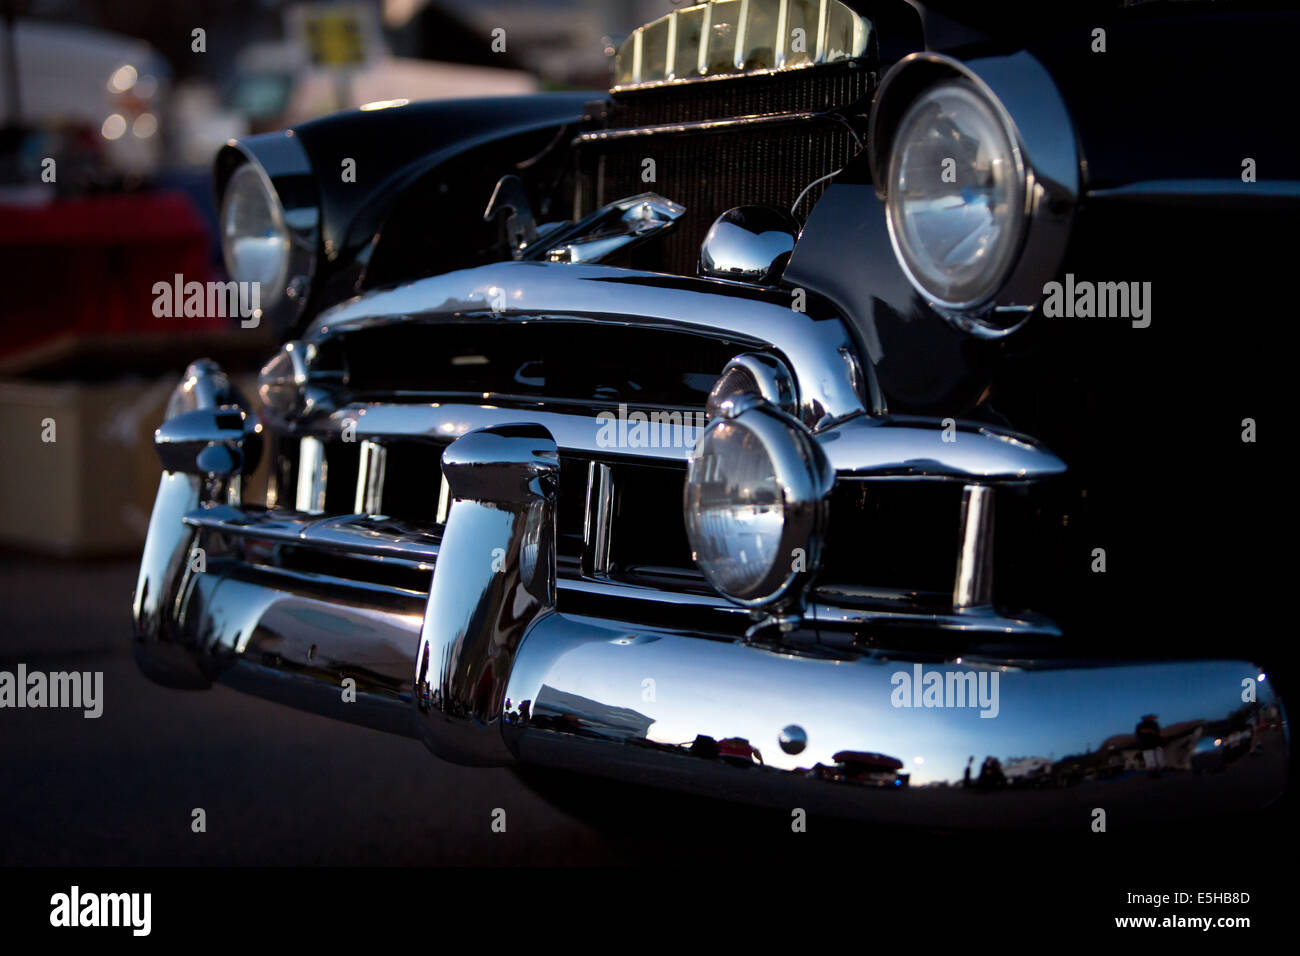 Stoßstange Stock Photos & Stoßstange Stock Images - Alamy